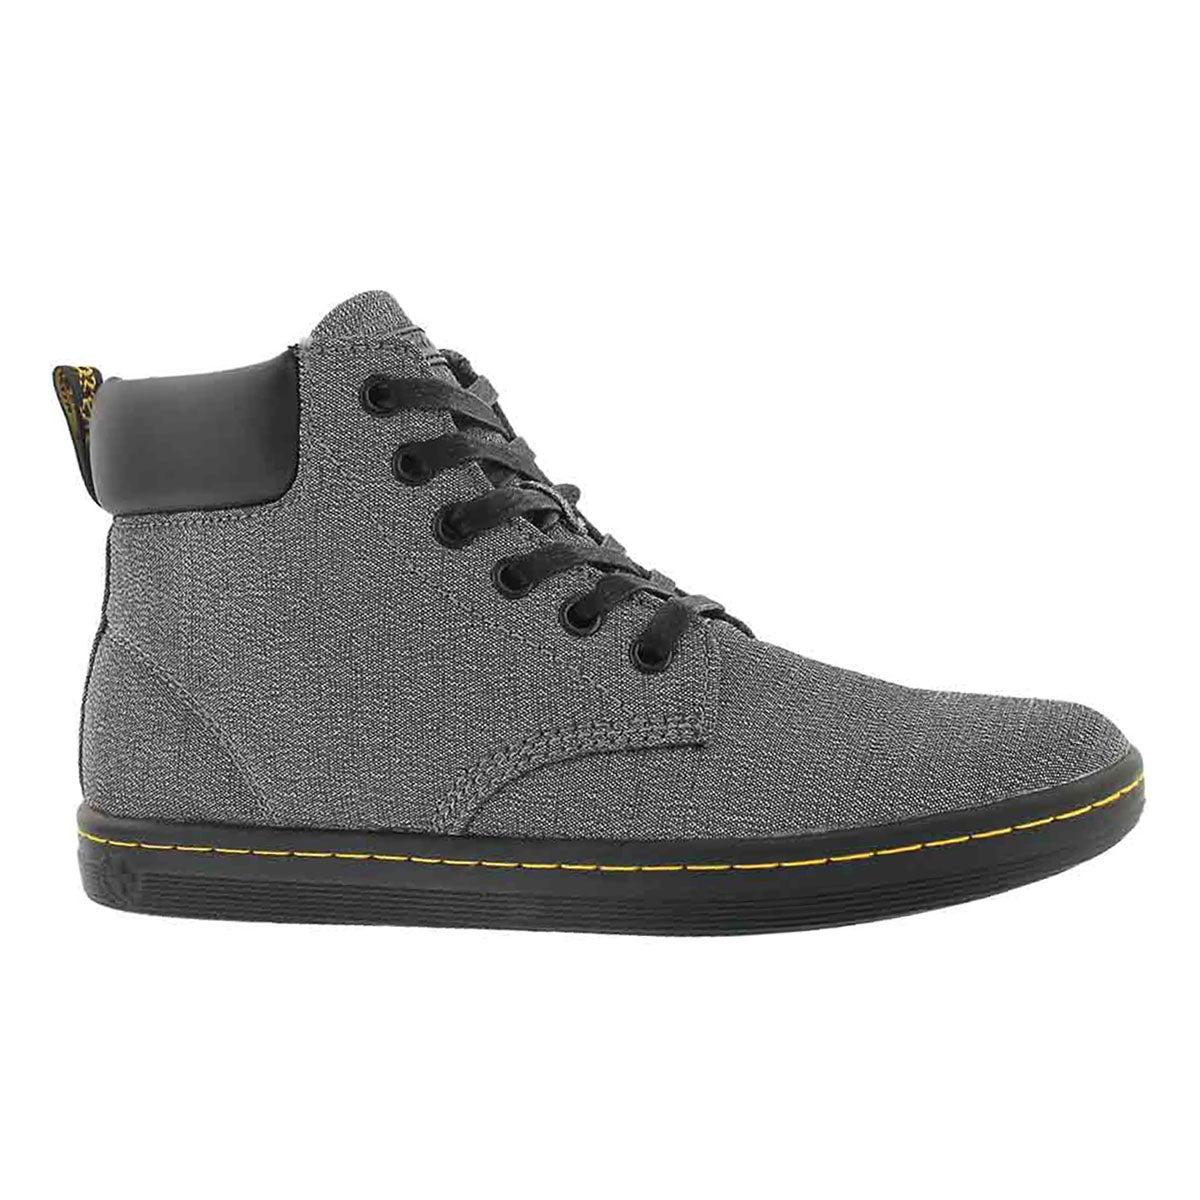 Women's MAELLY 6-eye grey ankle boots